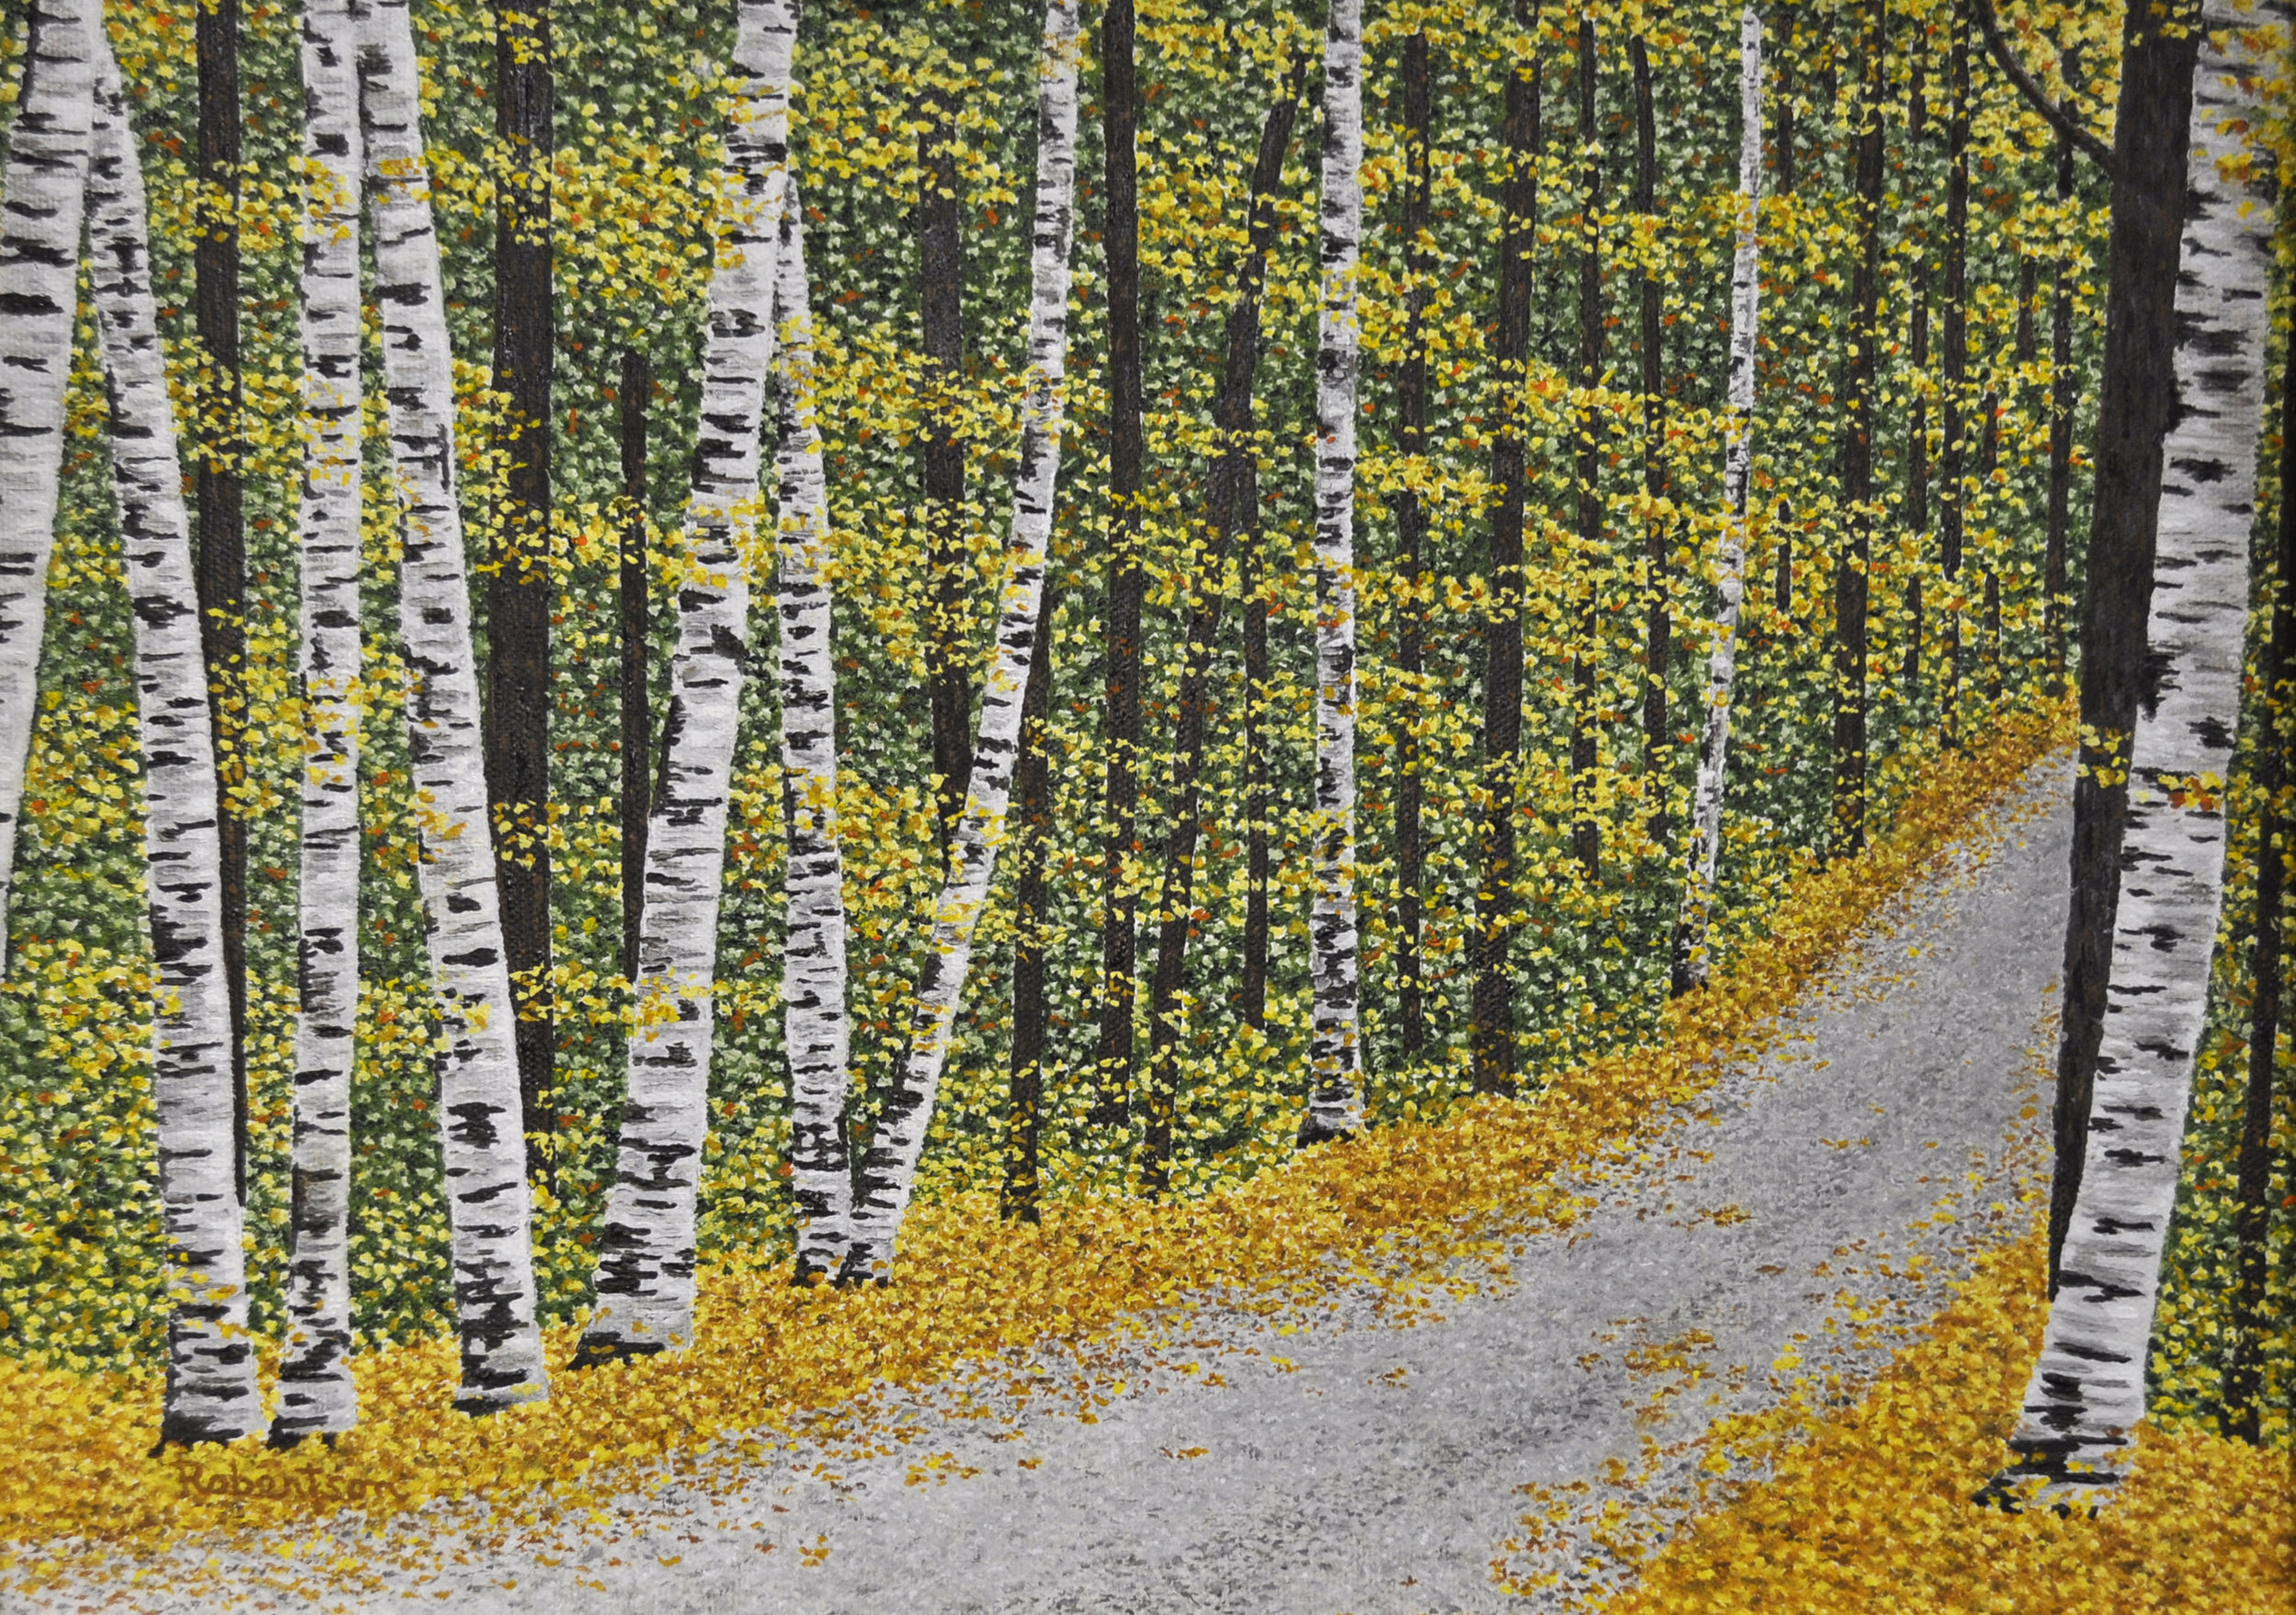 - Birches oil 12x16